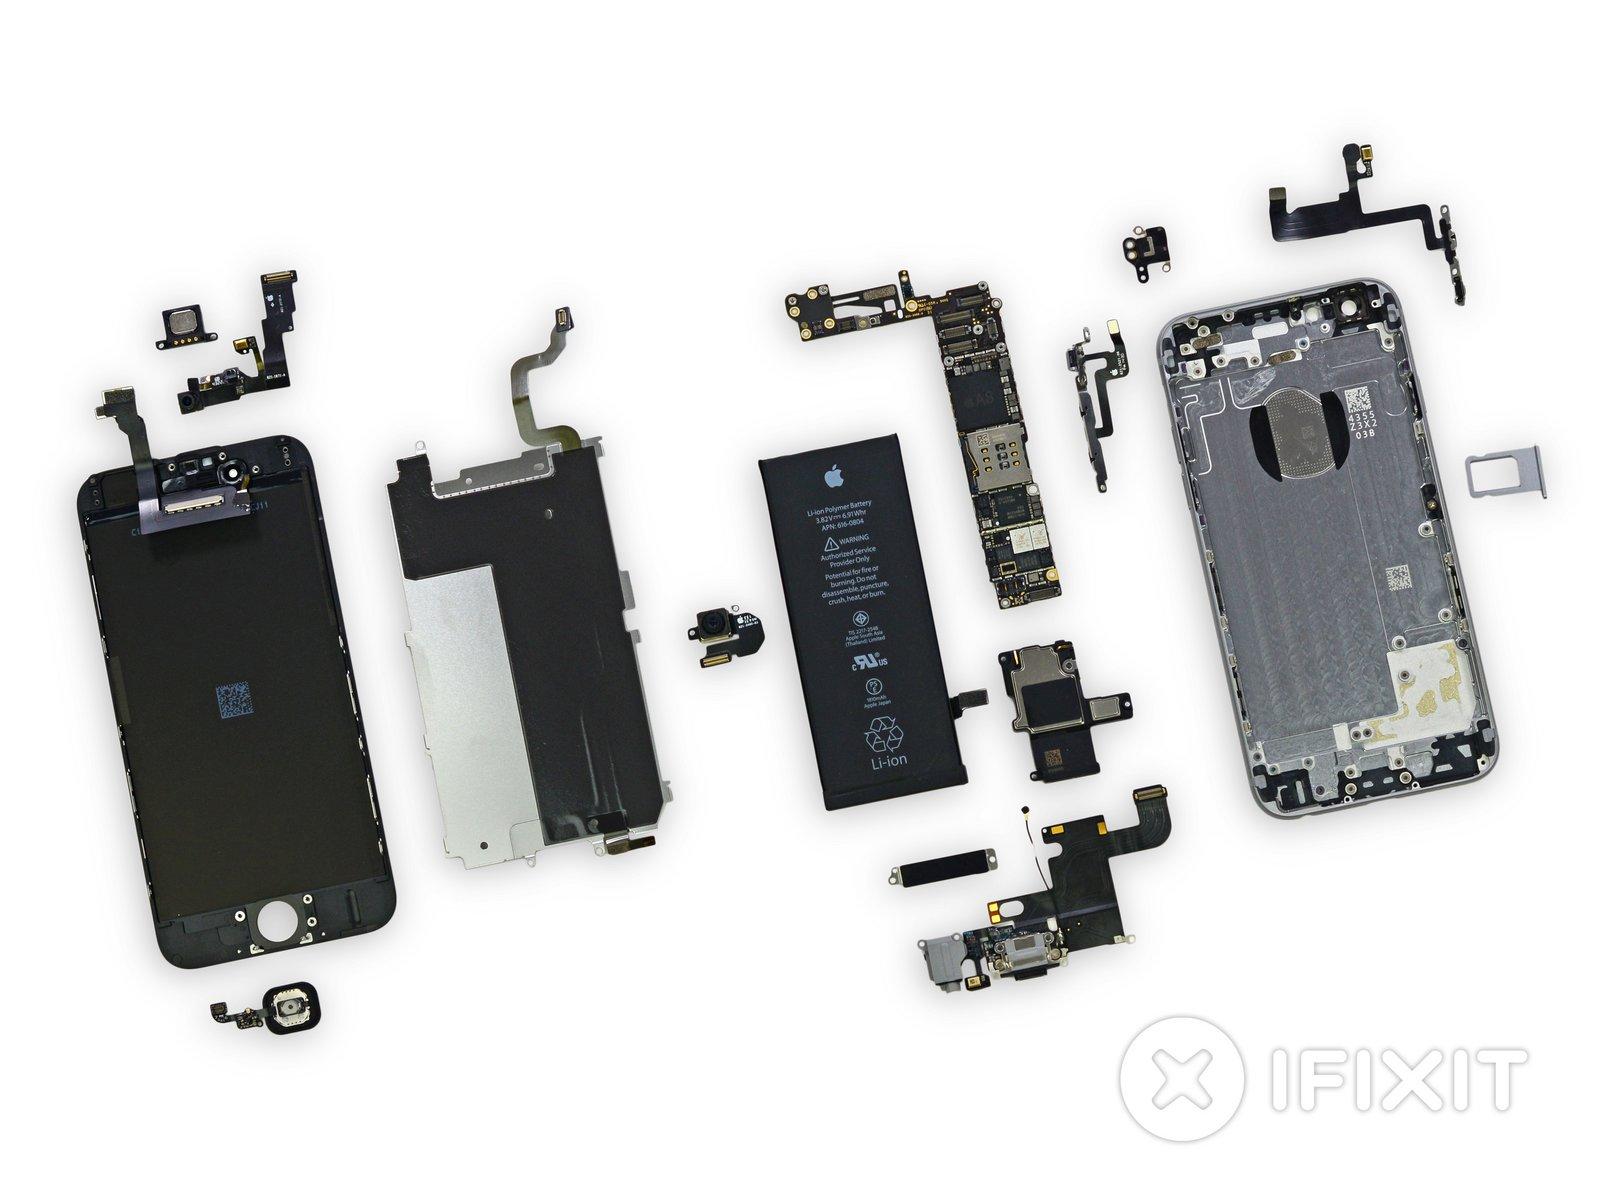 Iphone 6 Teardown Ifixit G Five Mobile Circuit Diagram